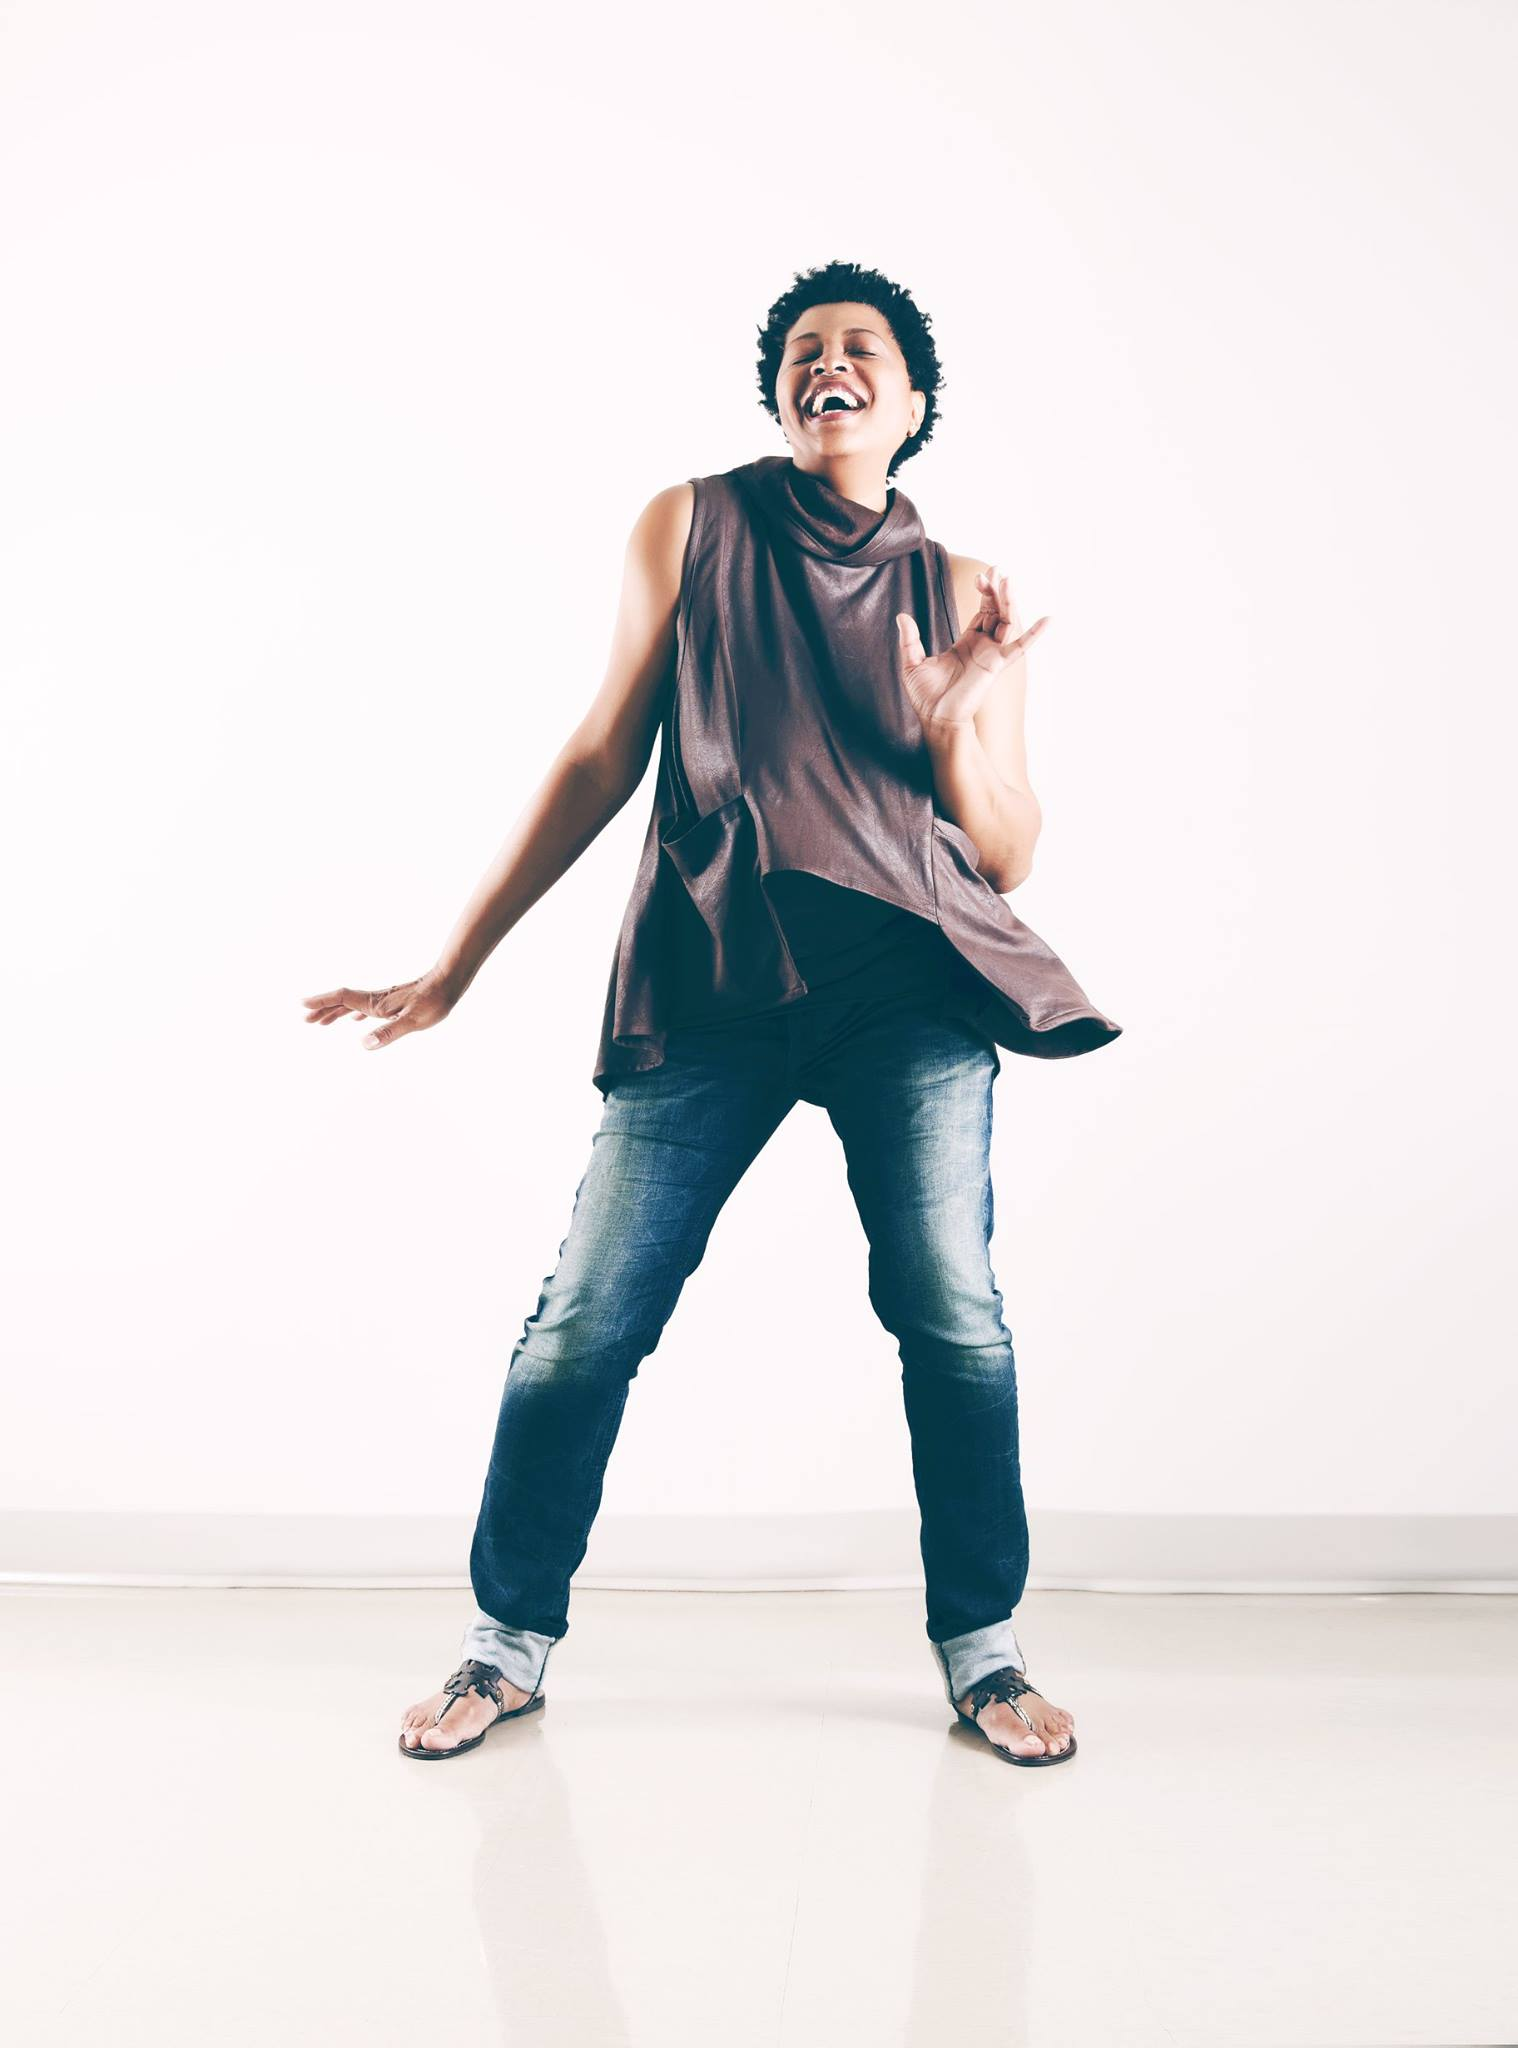 Lisa Fischer, photo by Djeneba Aduayom